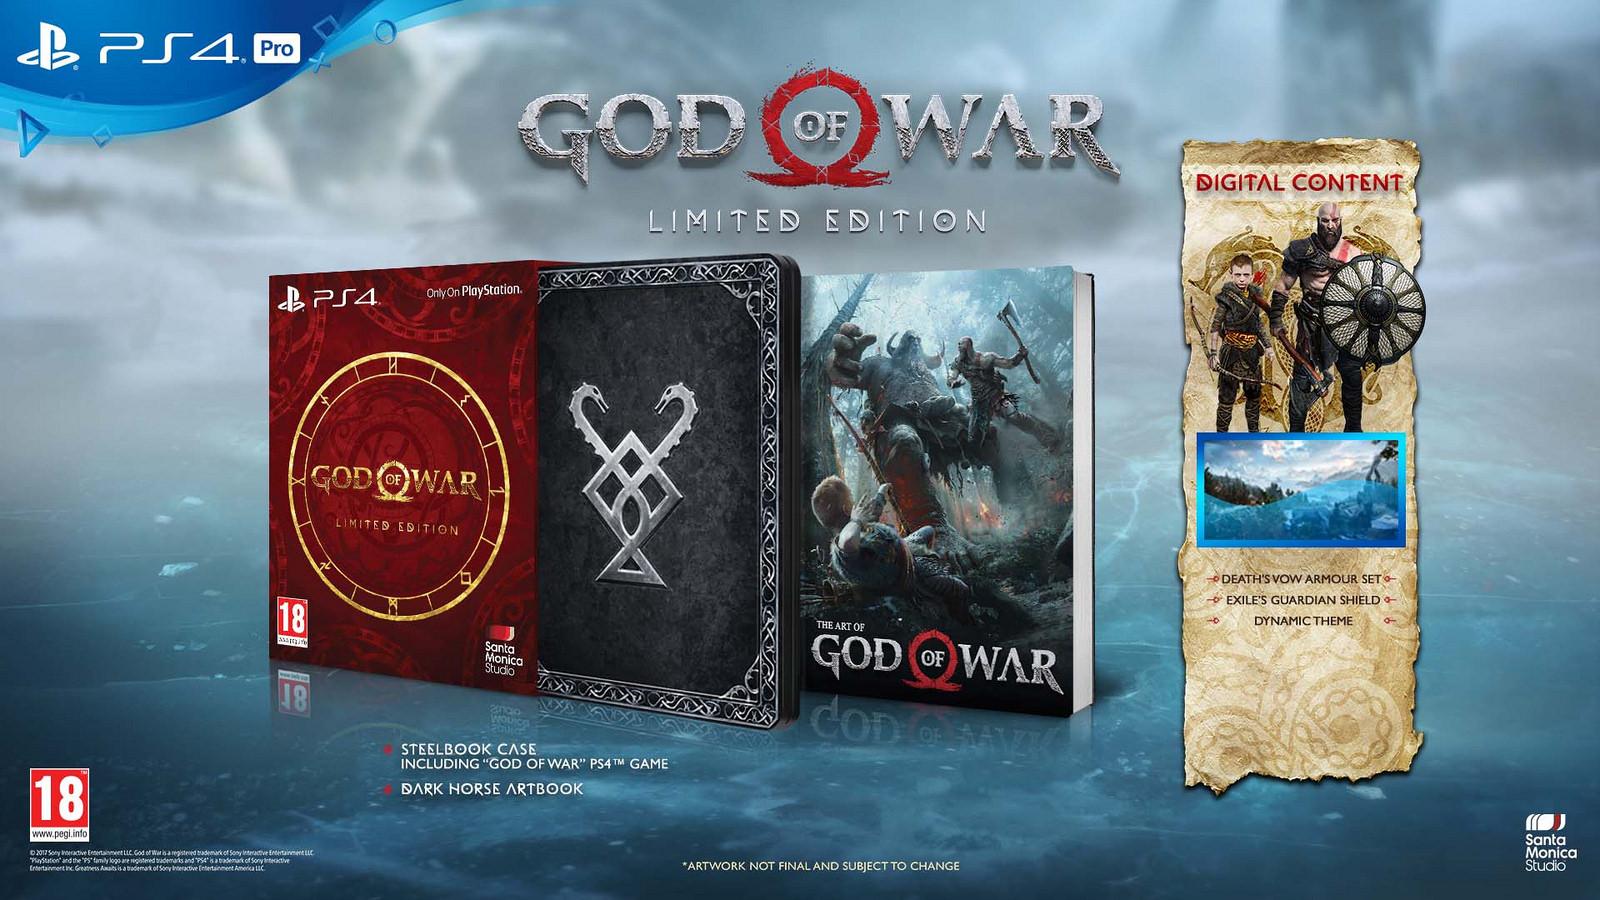 God of War: Limited Edition